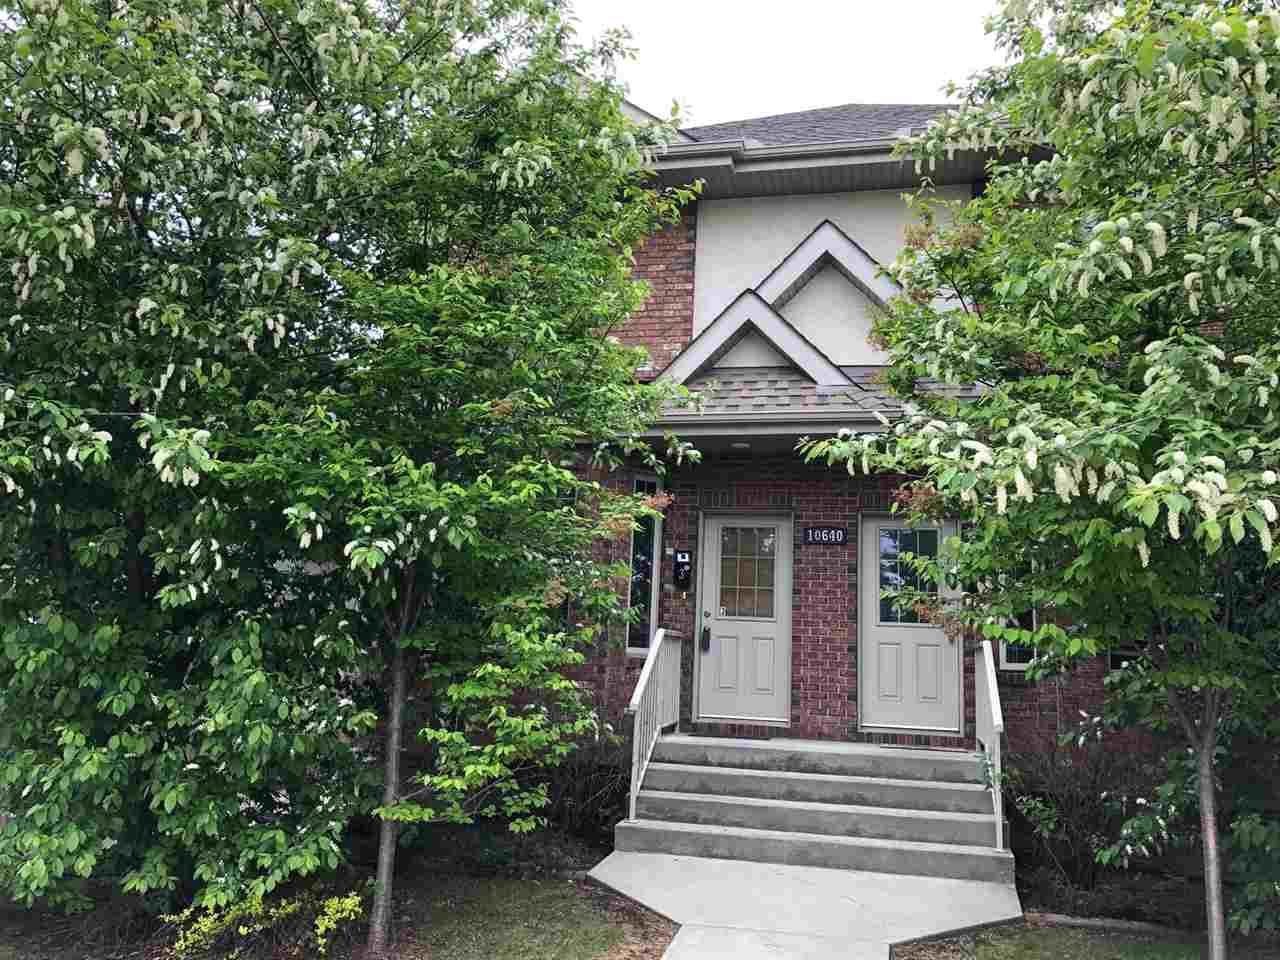 Main Photo: 3 10640 81 Avenue in Edmonton: Zone 15 Townhouse for sale : MLS®# E4239875